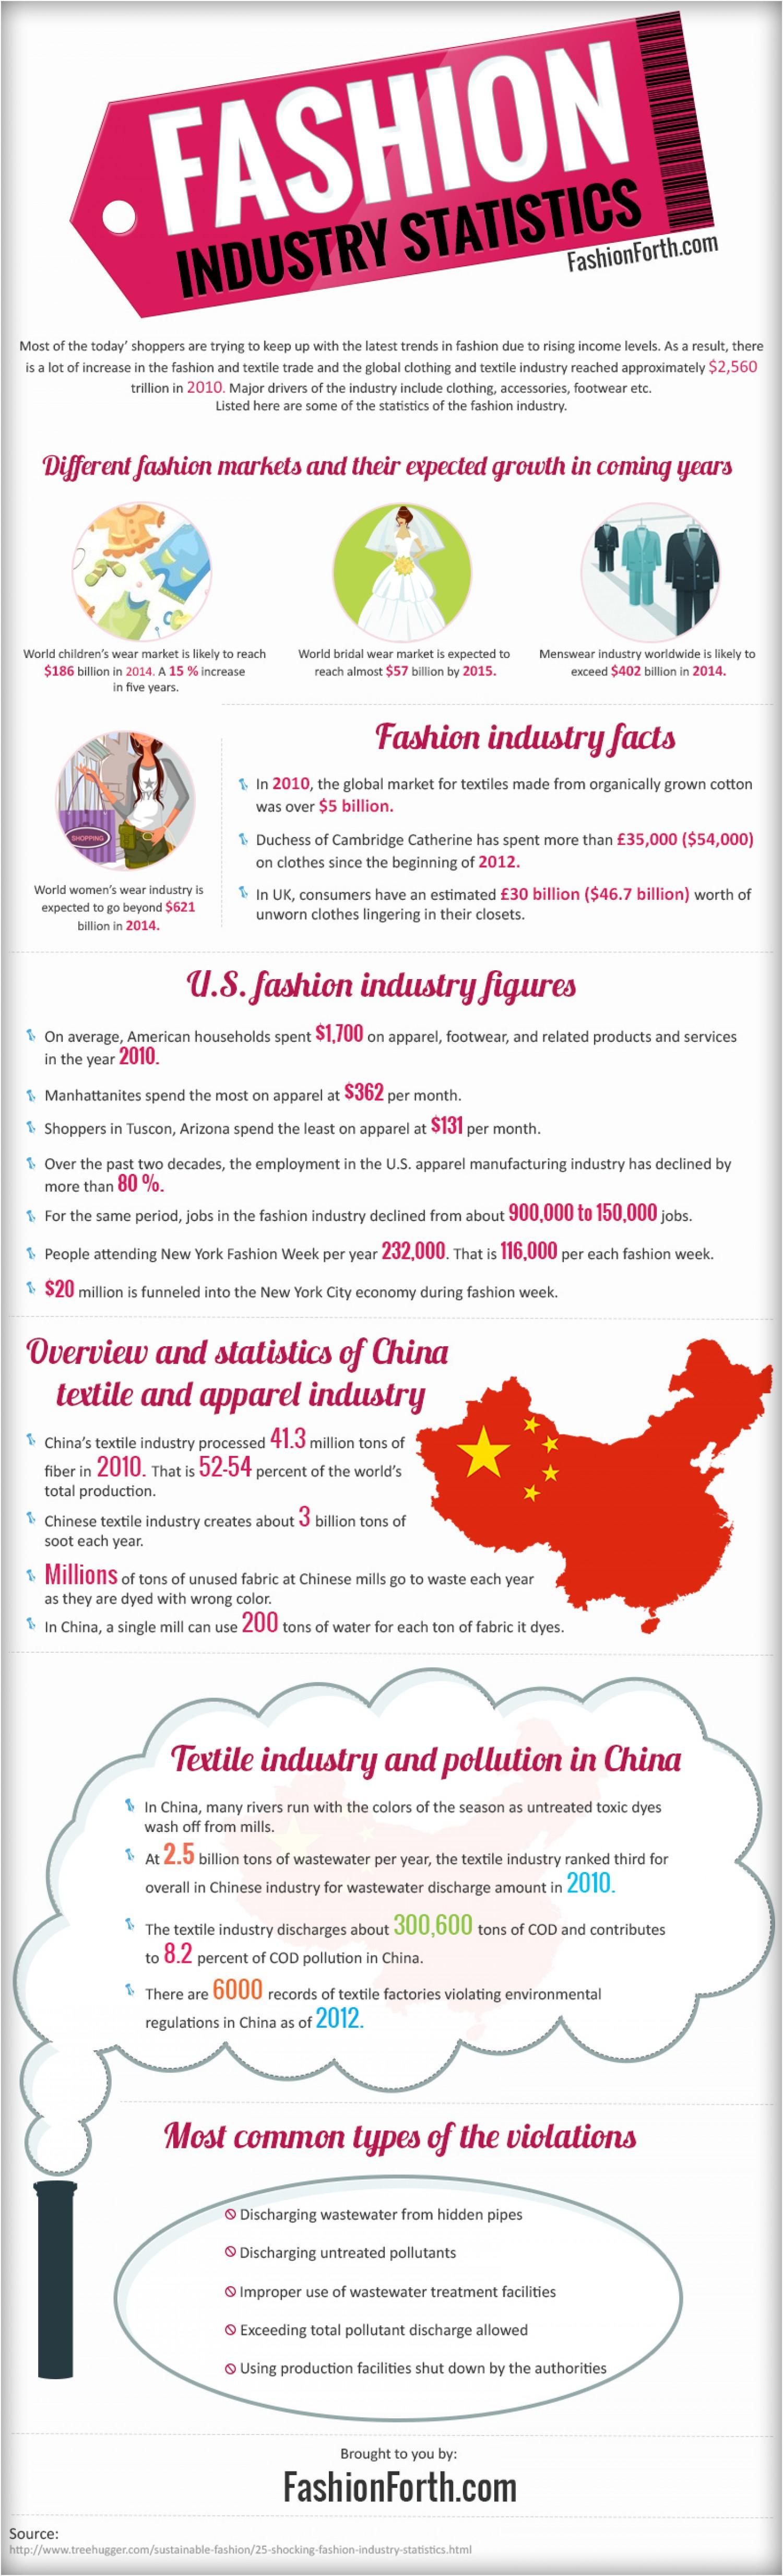 1. Fashion Industry Statistics